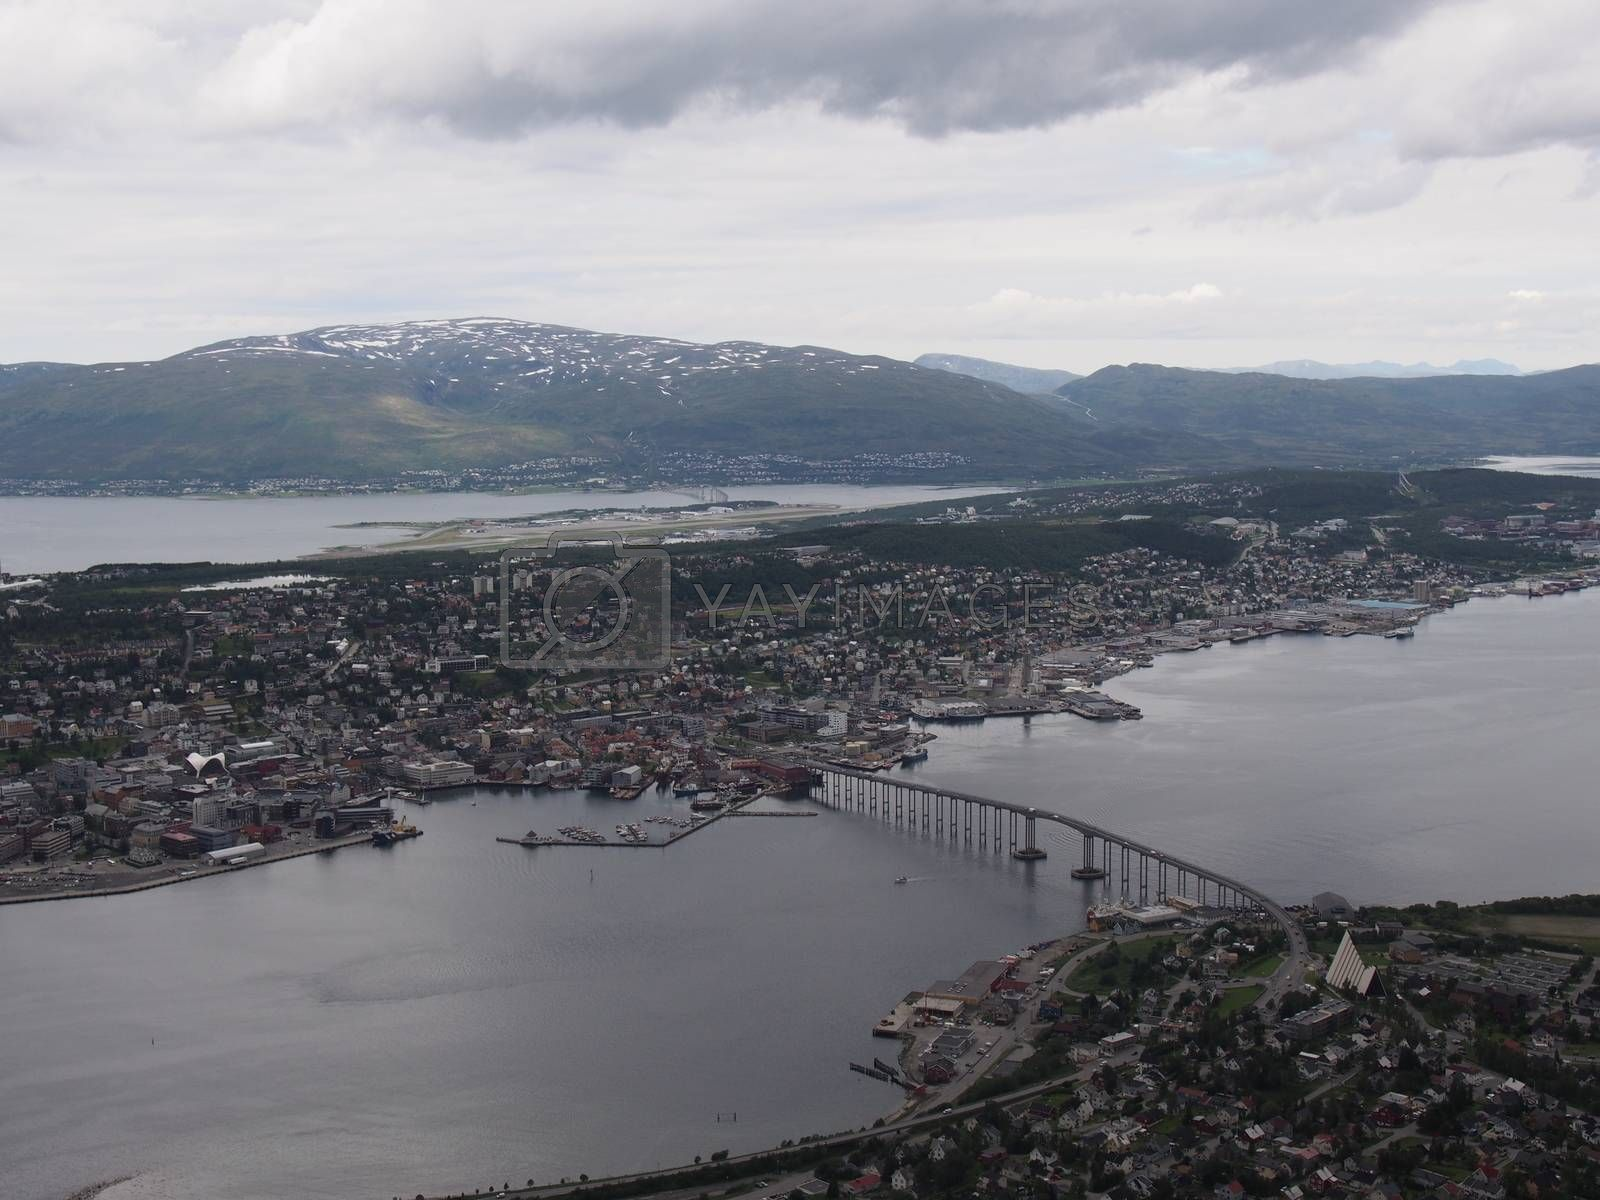 Royalty free image of Tromsø, Norway by benedijo2